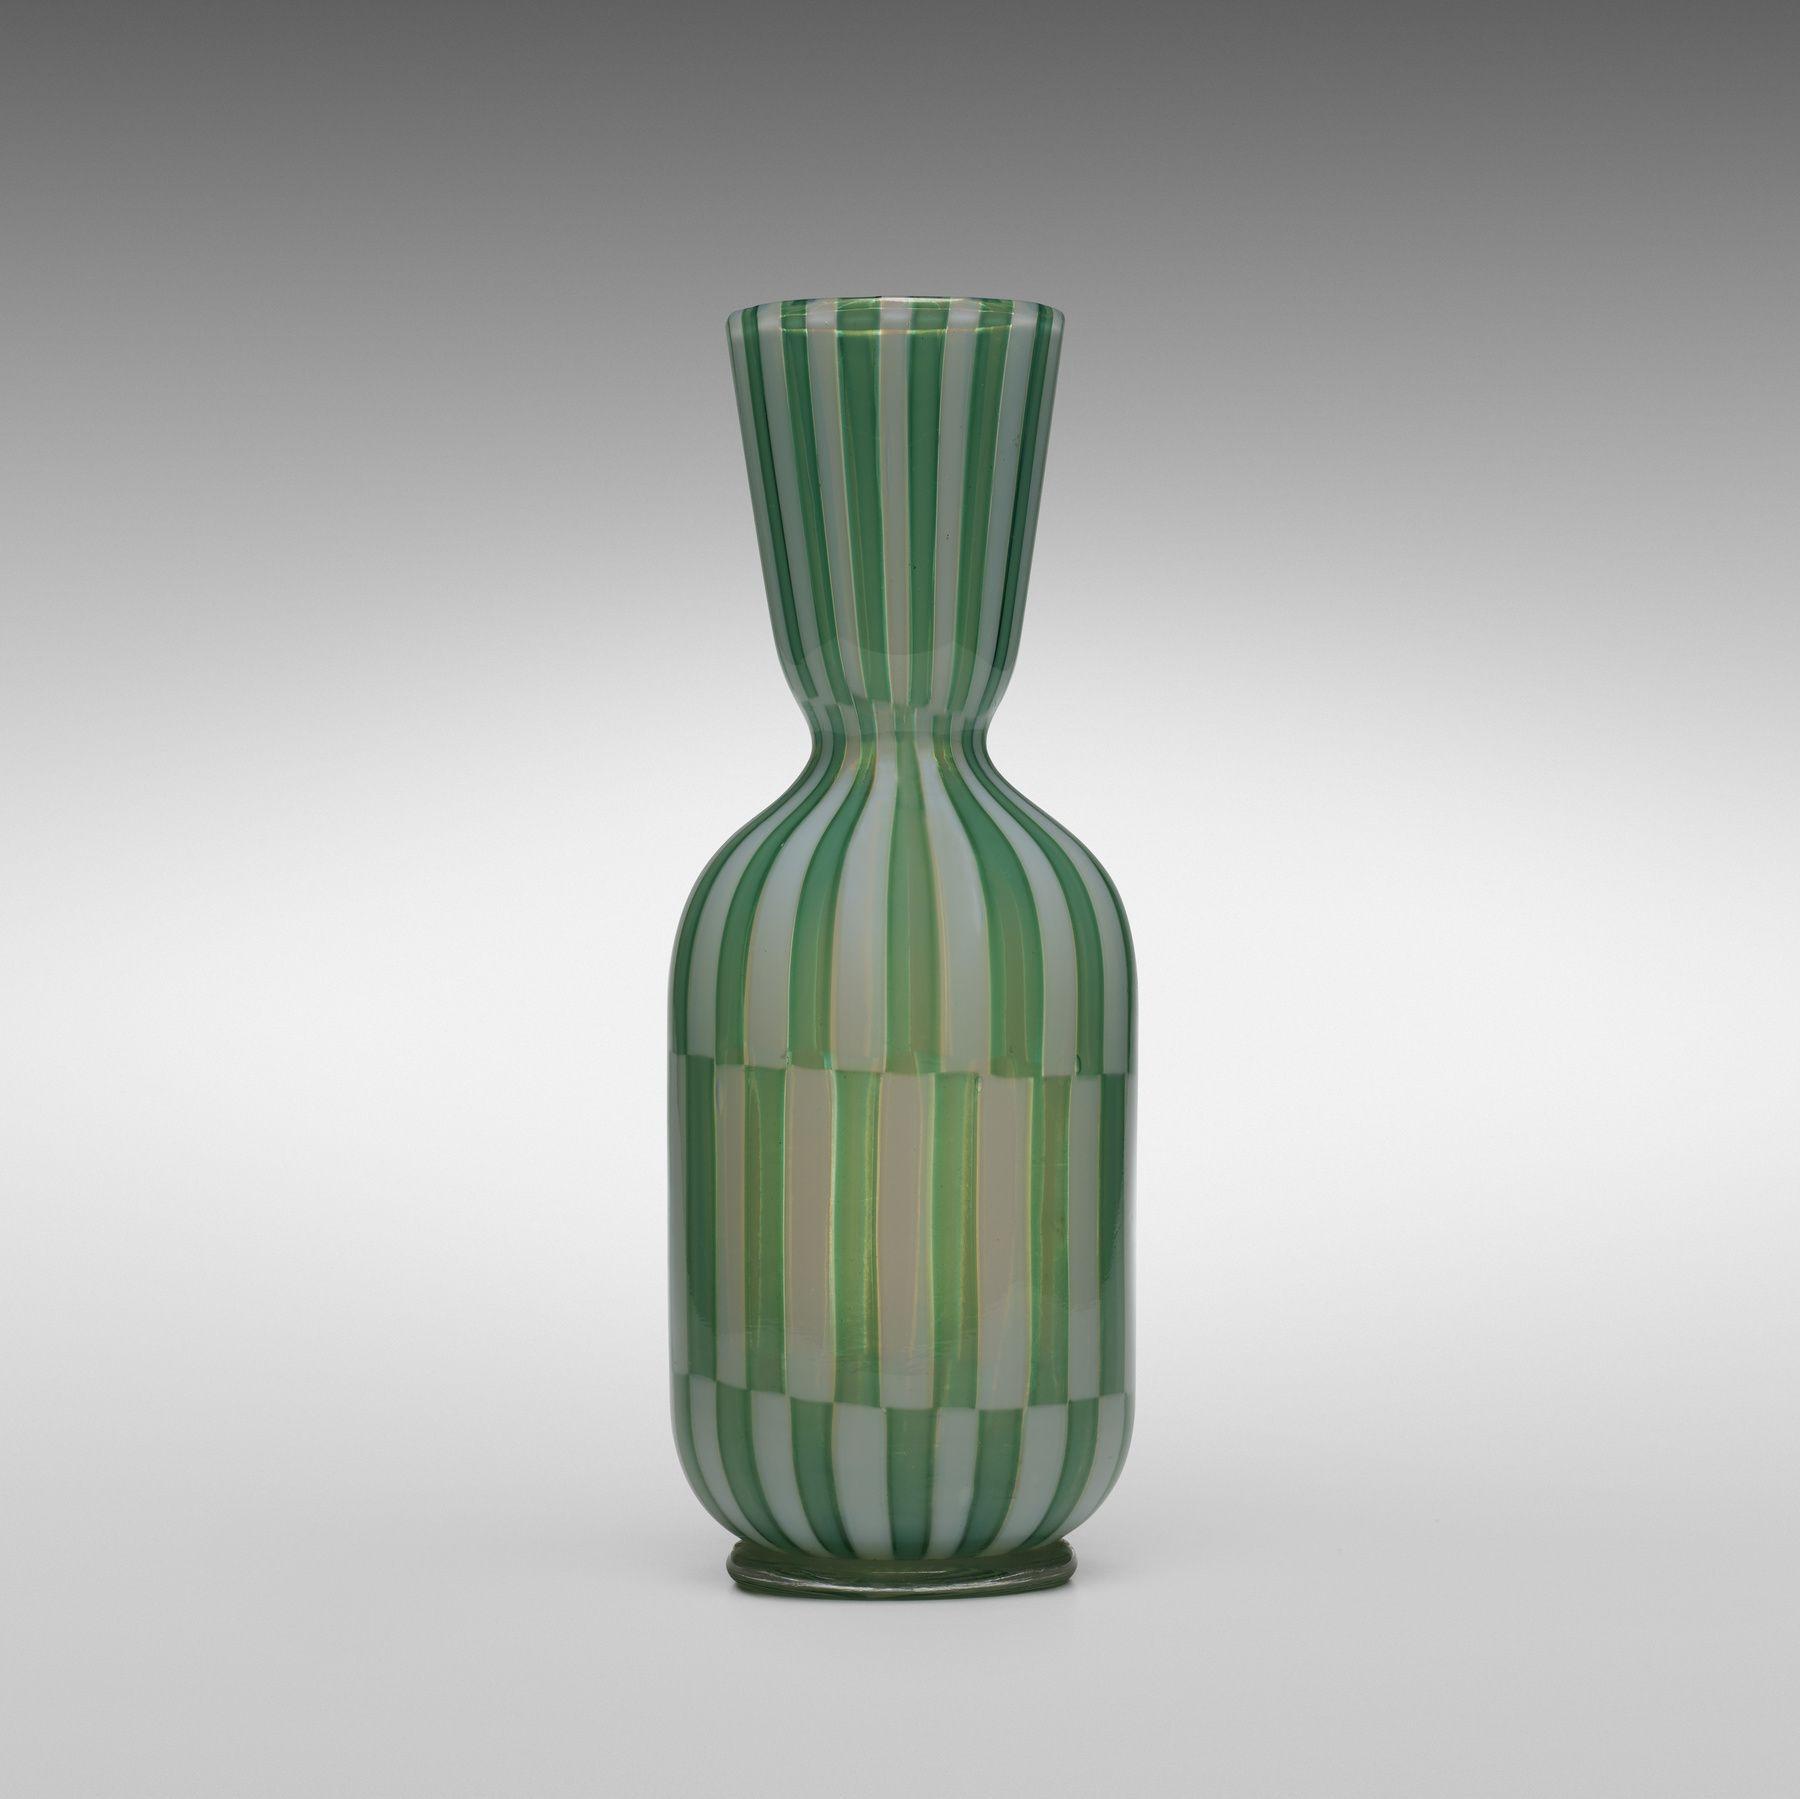 thin glass vase of ercole barovier bicolori vase wright20 com important italian with regard to ercole barovier bicolori vase wright20 com